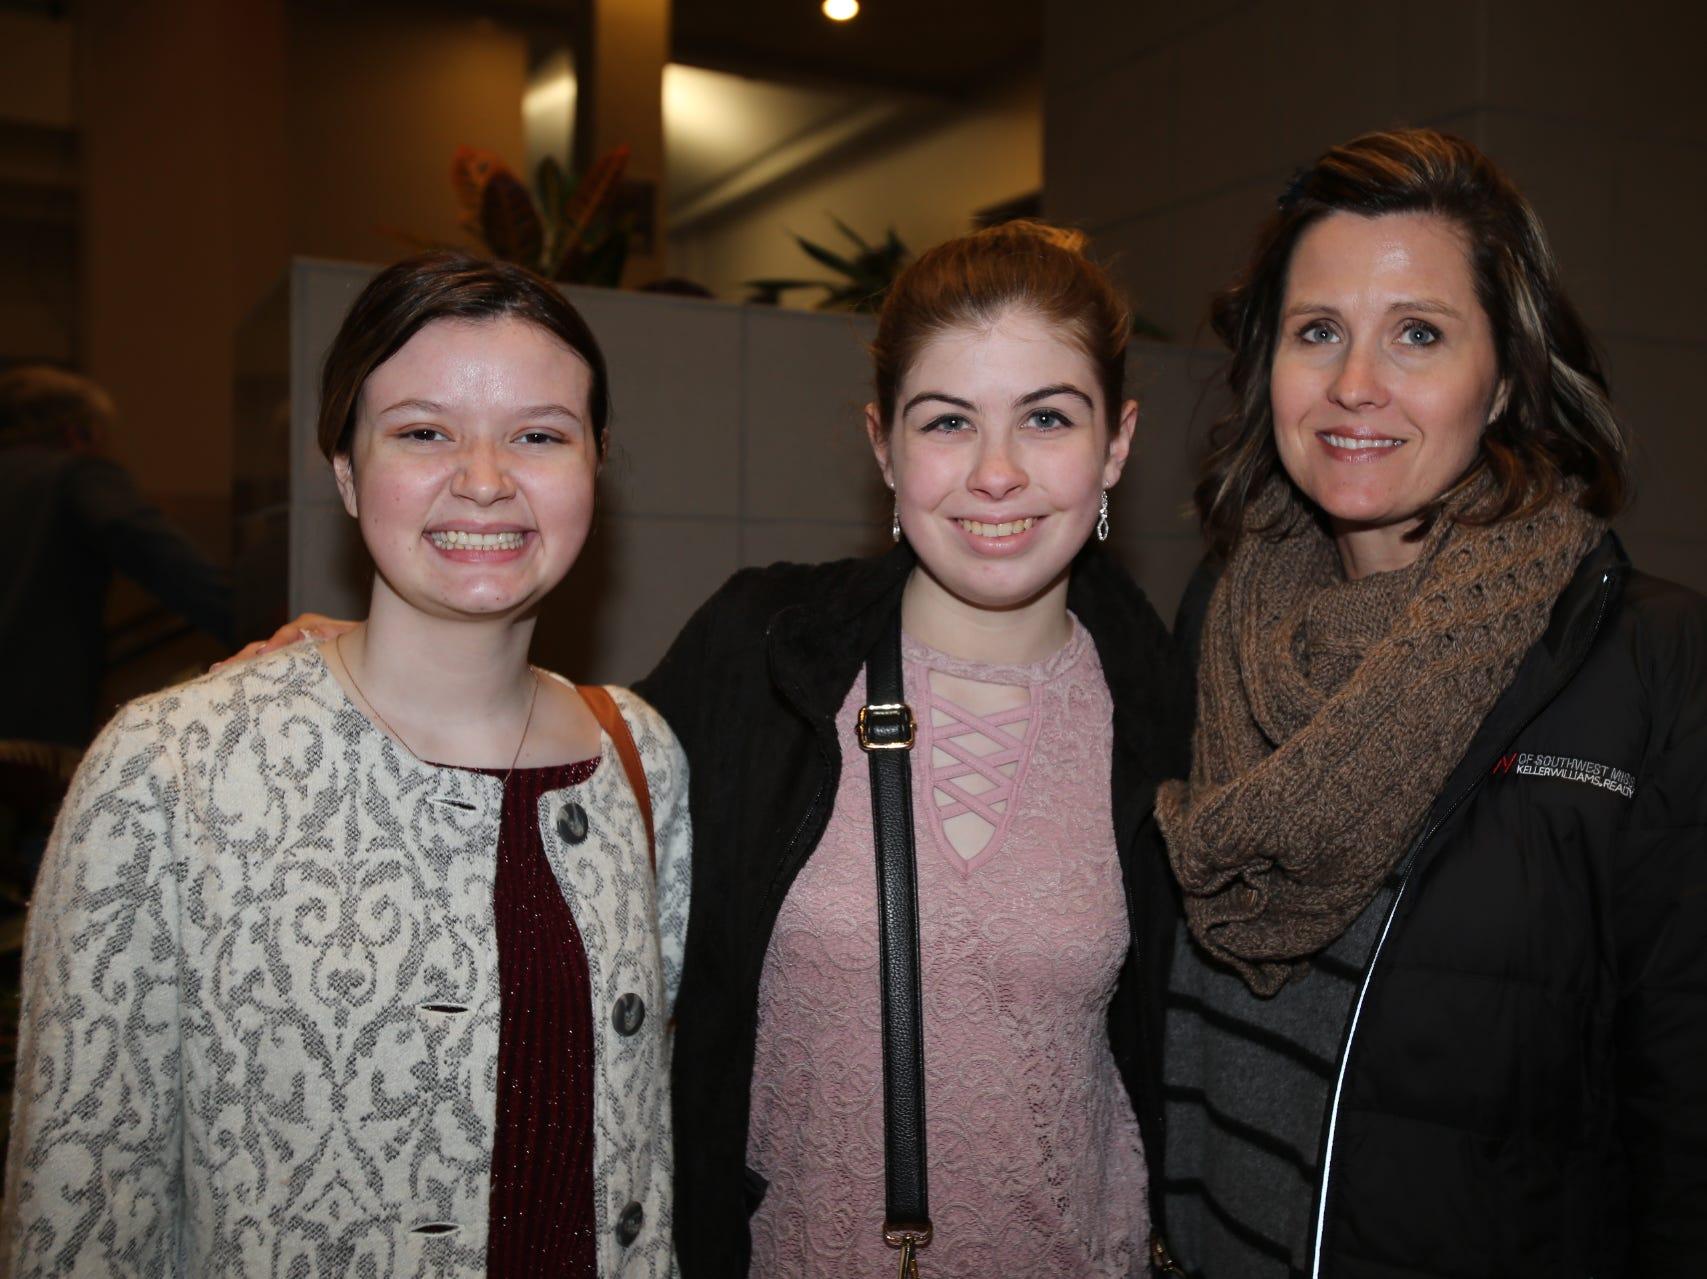 Georgia Phillips, Eva and Audrey Sneed